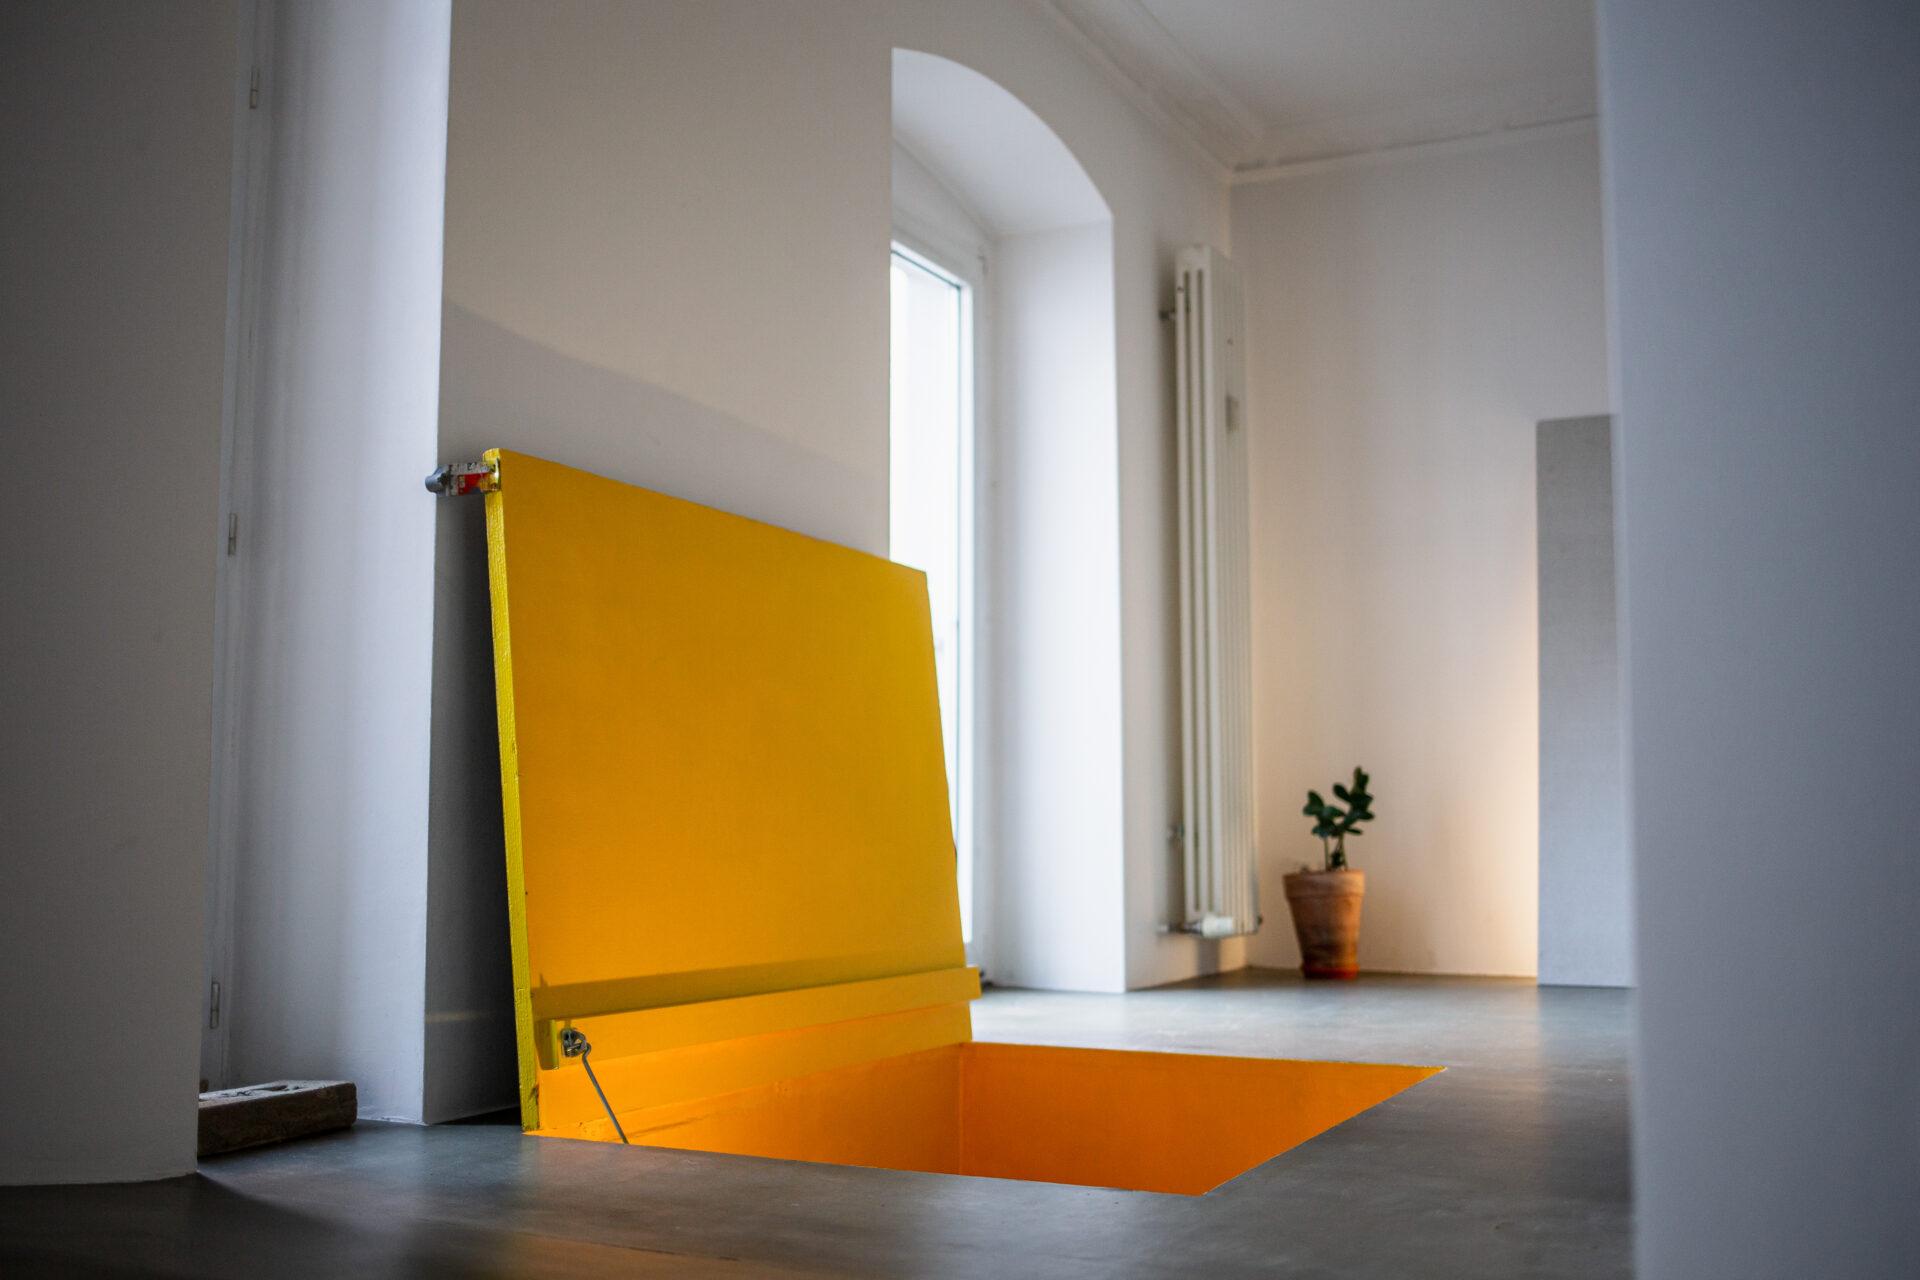 Interior_080240_Carolin-Weinkopf